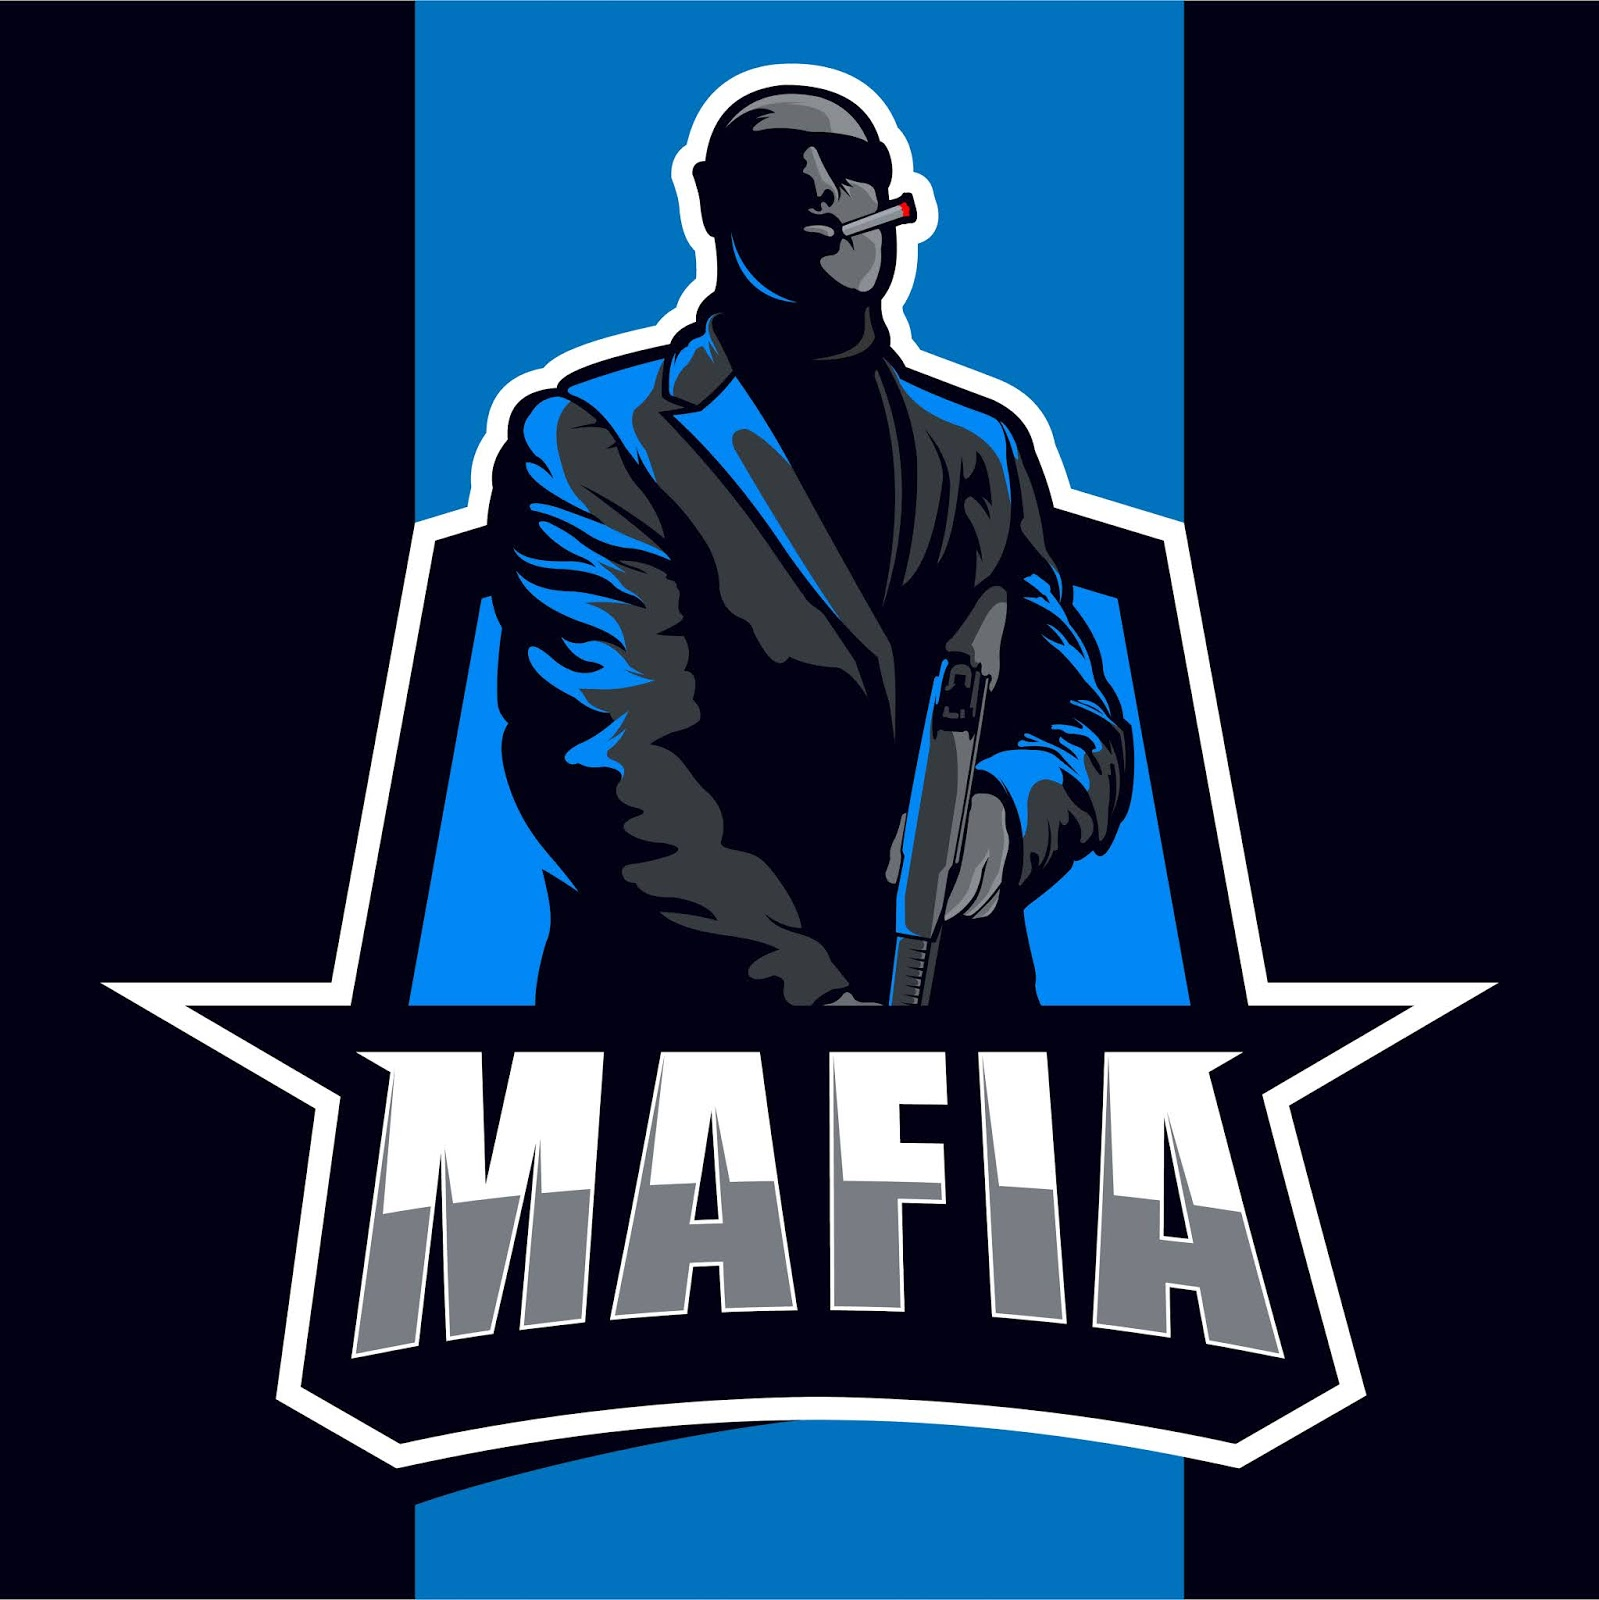 Mafia Mascot Esport Logo Free Download Vector CDR, AI, EPS and PNG Formats